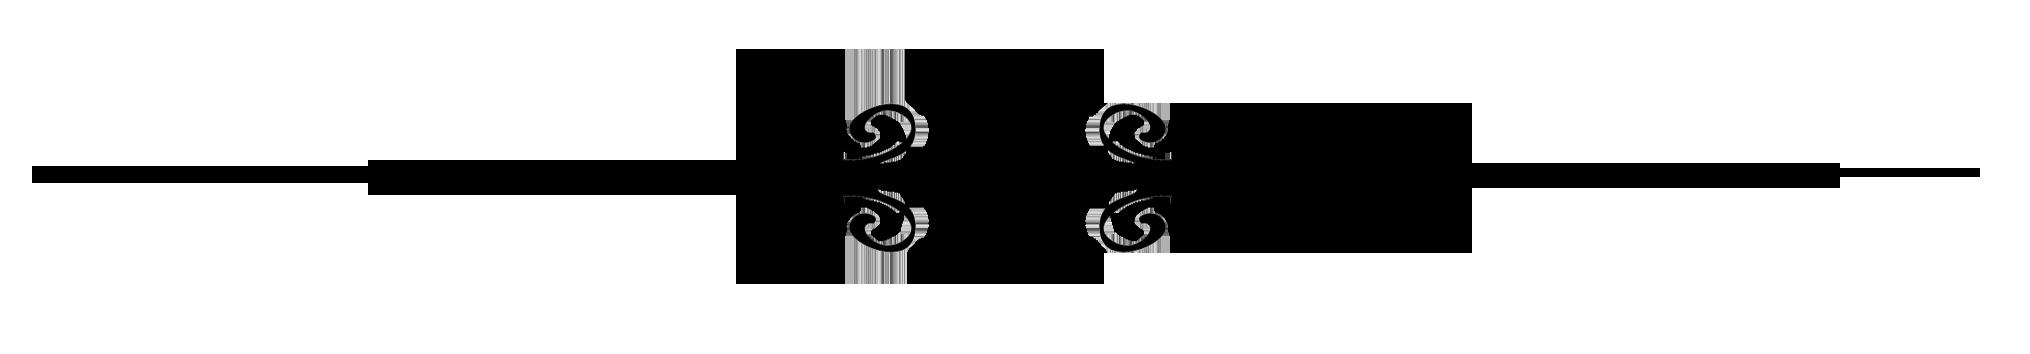 lines clipart horizontal